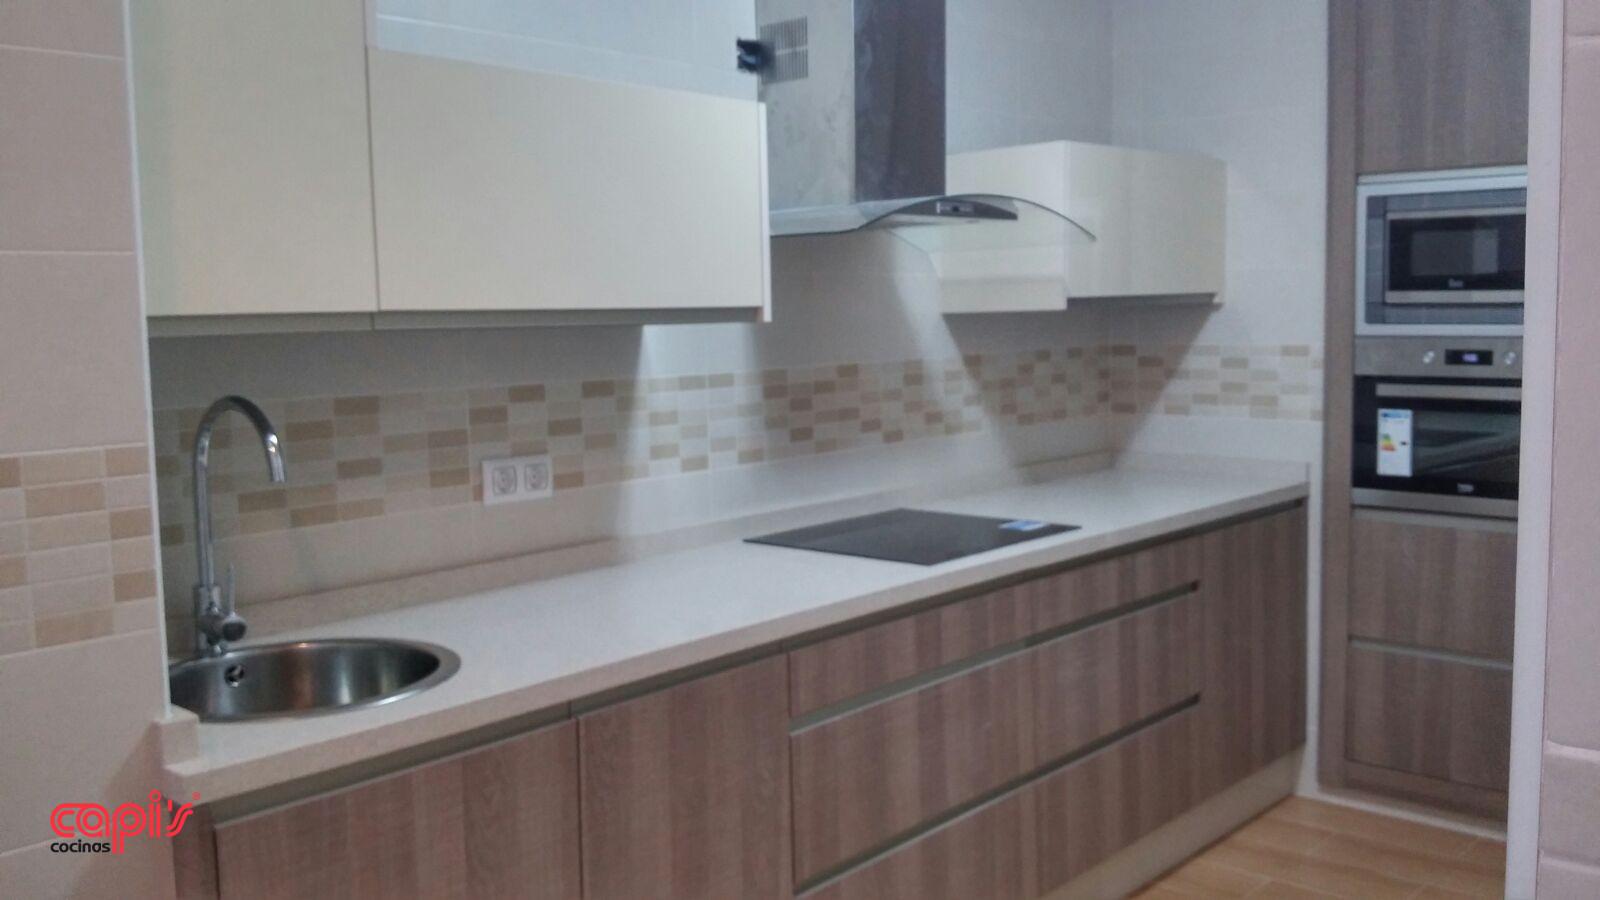 Cocina con efecto madera cocinas capis dise o y - Cocinas con diseno ...